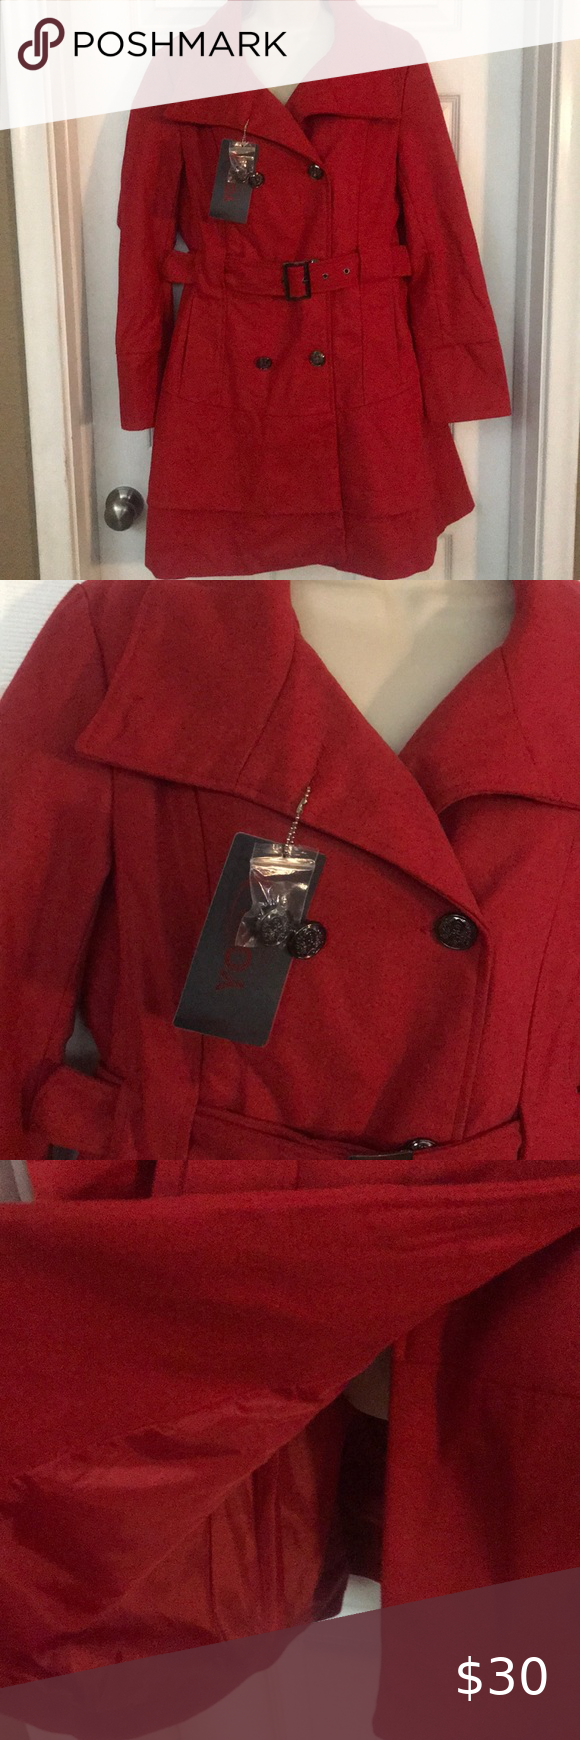 Nwt Yoki Outerwear Collection Xl Nwt Red Size Xl Length Top To Bottom 40 Arm Length 25 Waist 17 Yoki Jackets Coats Pea Coats In 2020 Outerwear Peacoat Yoki [ 1740 x 580 Pixel ]